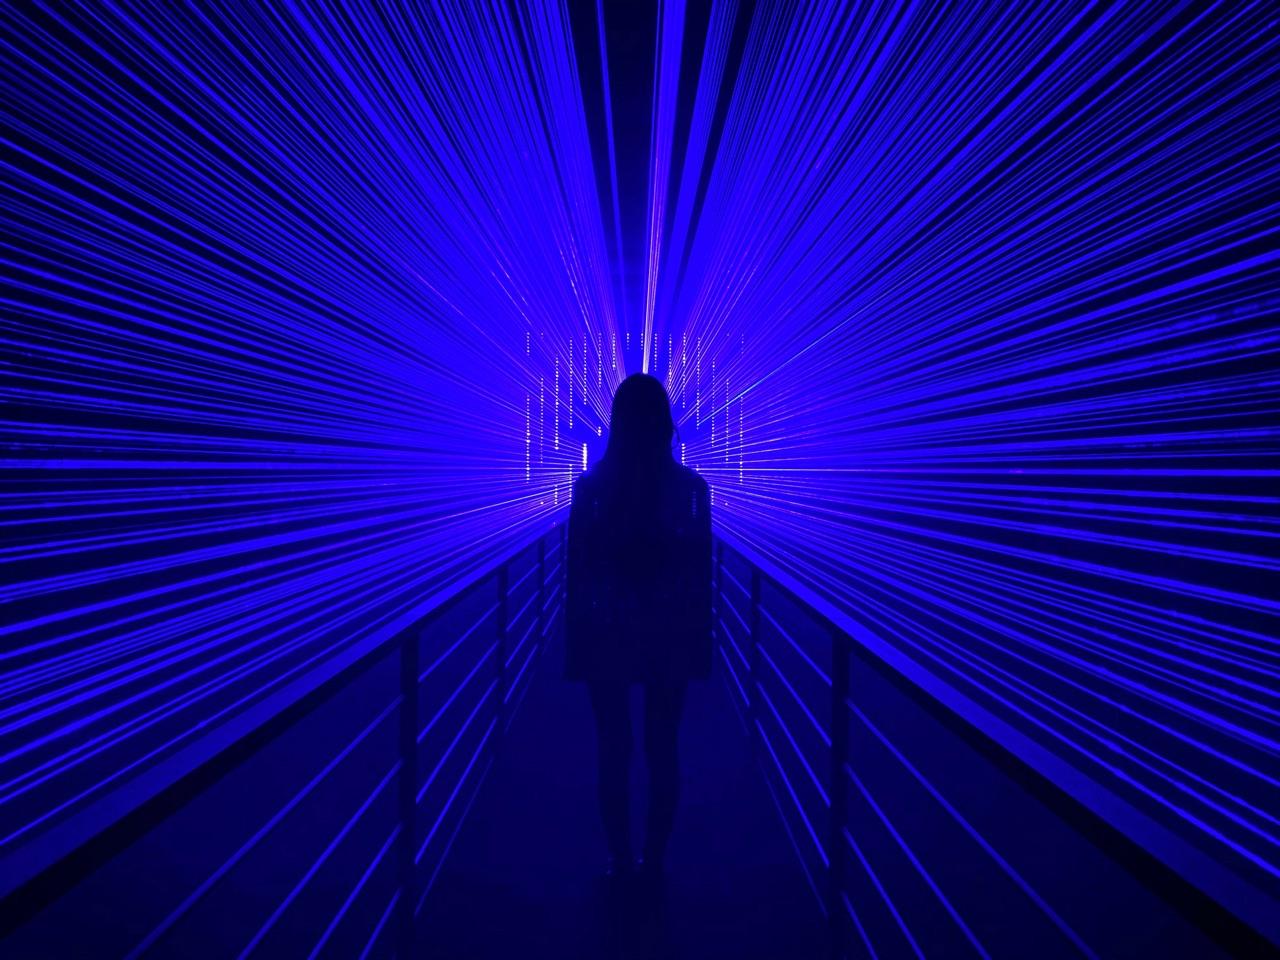 Shot on iPhone Night Mode Photo Challenge met lasers.